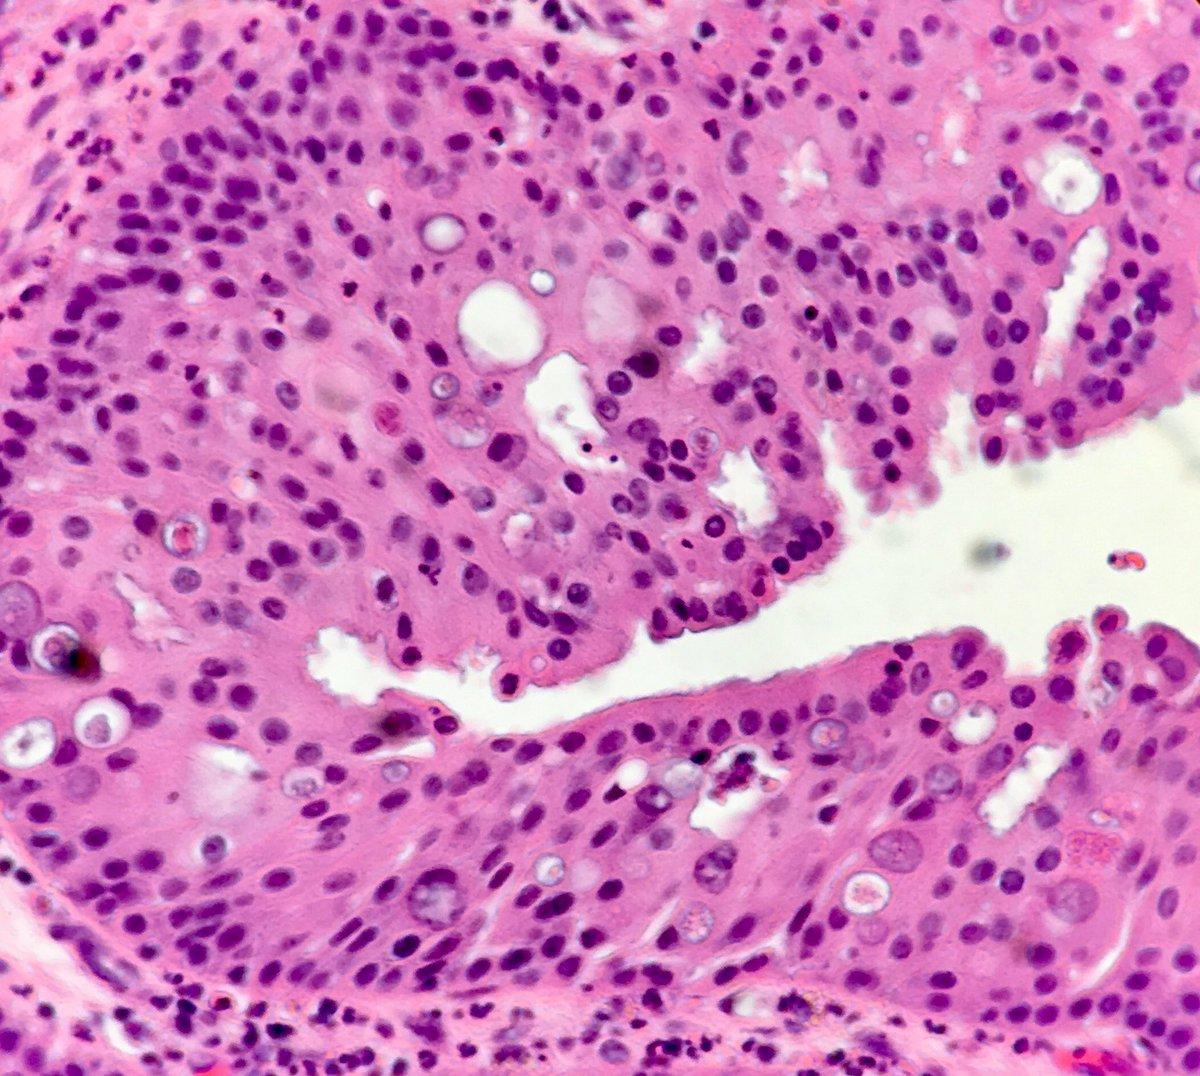 Oncocytic sinonasal papilloma, You May Also Like